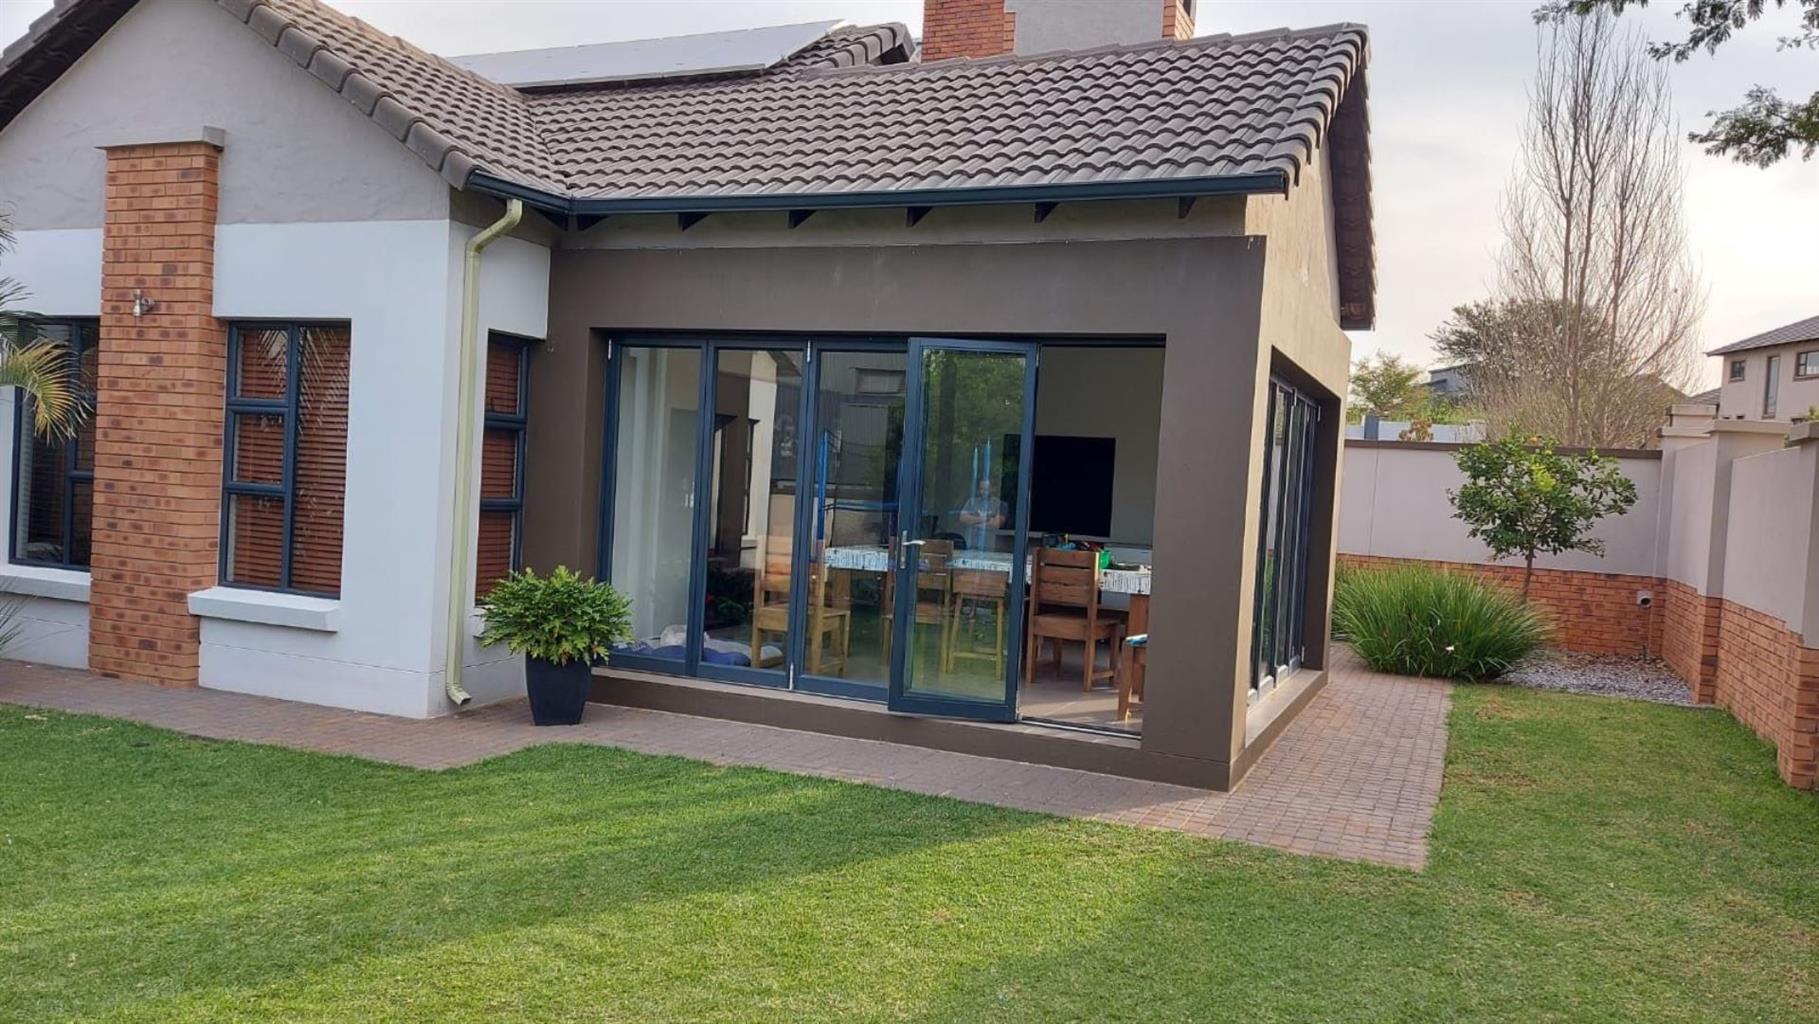 House Rental Monthly in MIDLANDS ESTATE